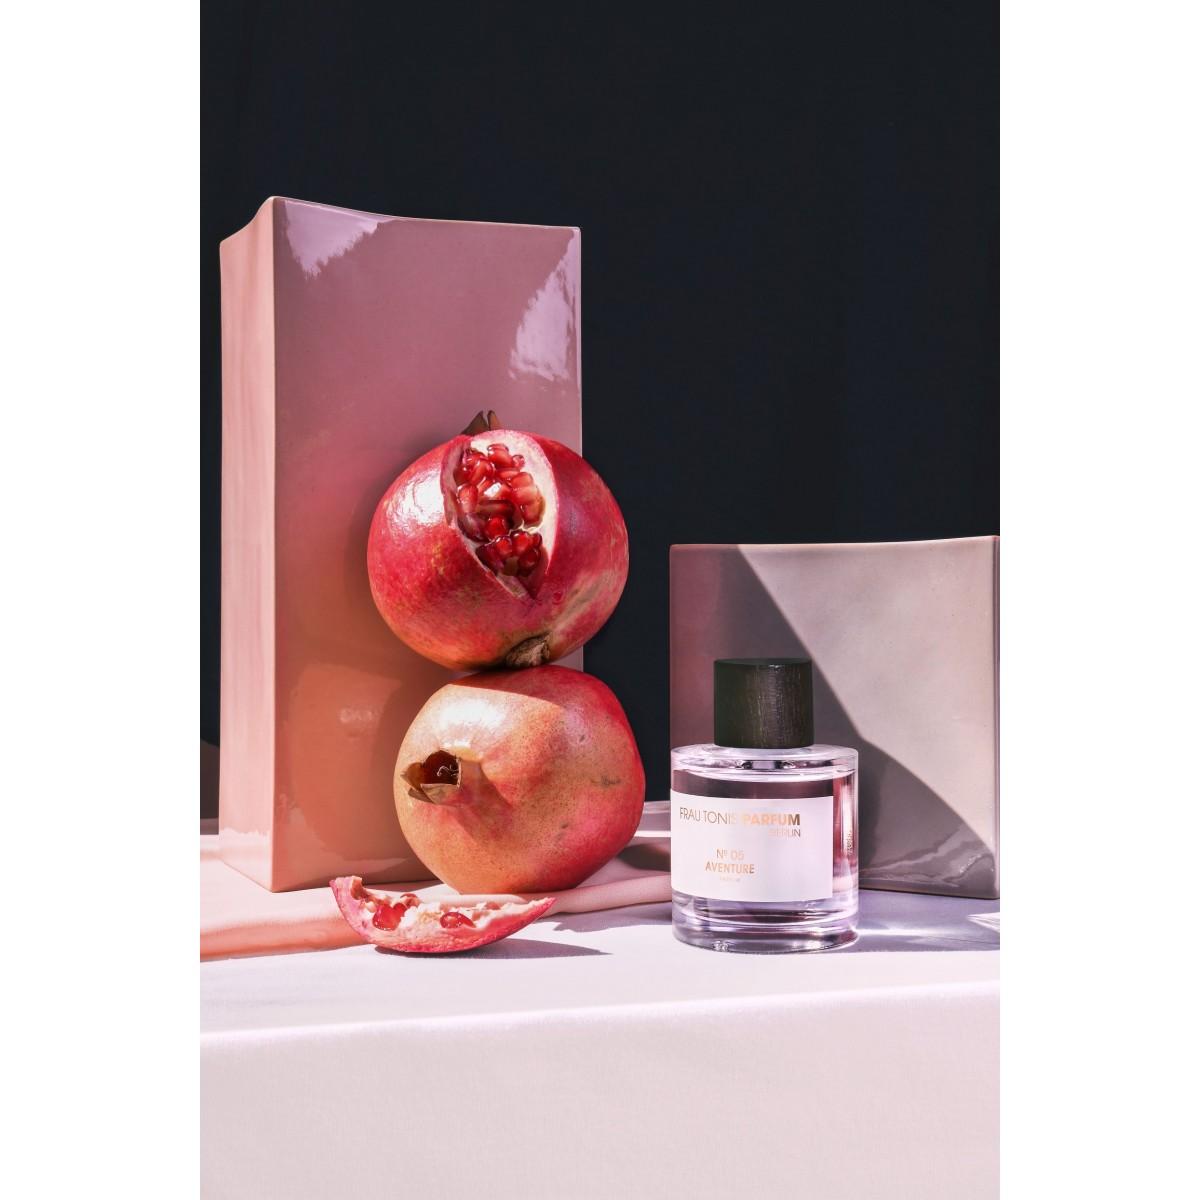 No. 05 Aventure | Parfum Intense (100ml) by Frau Tonis Parfum